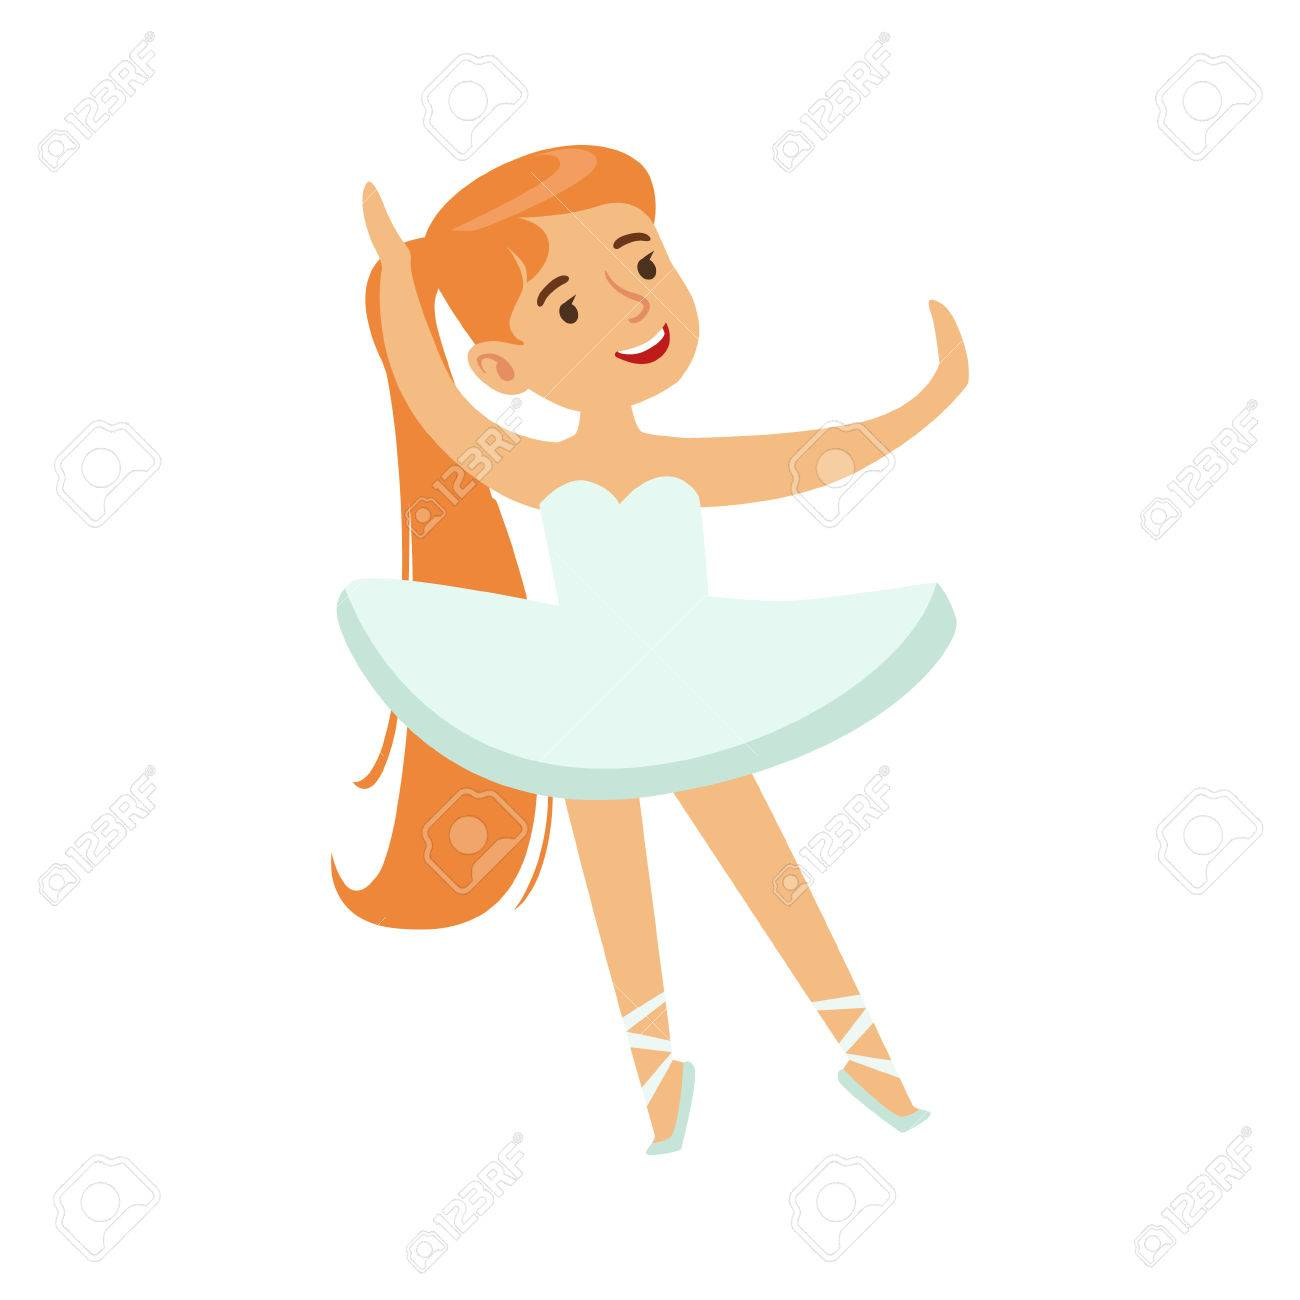 1300x1300 Little Girl In White Tutu Dancing Ballet In Classic Dance Class